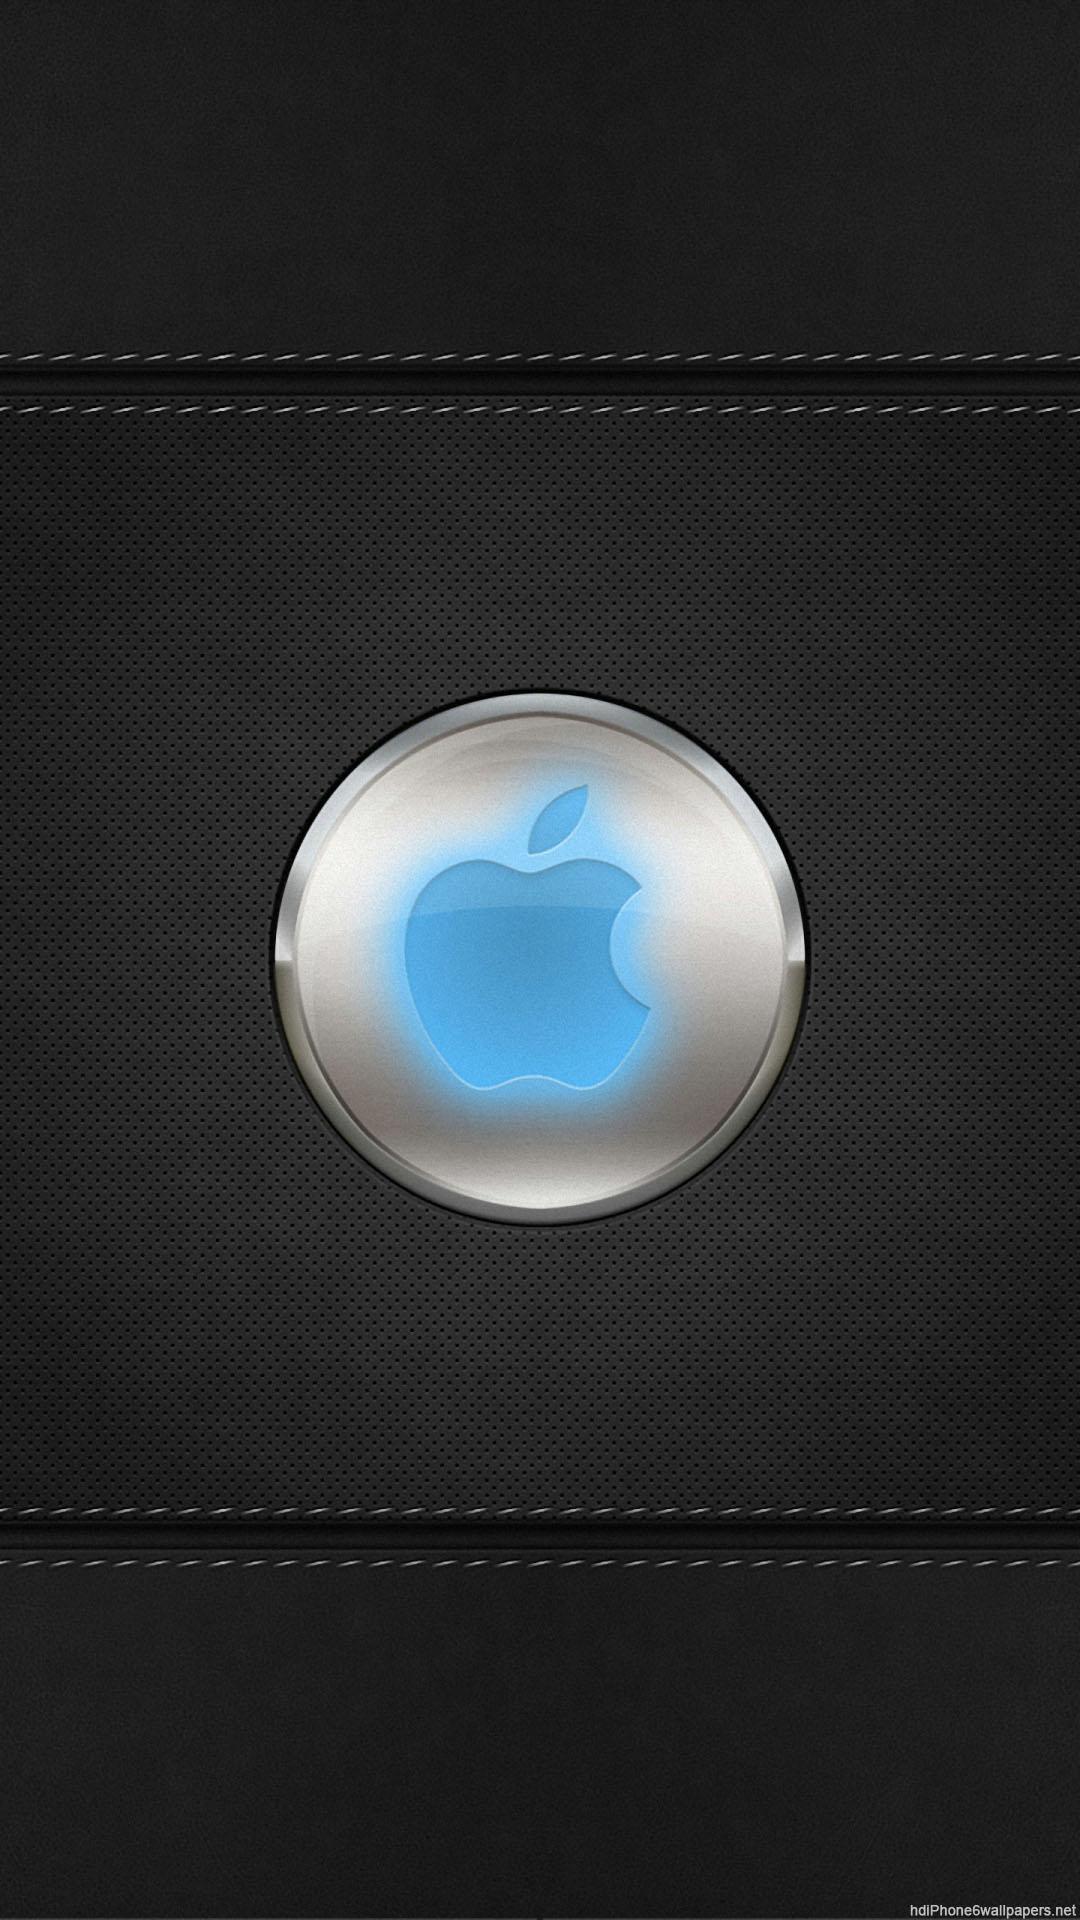 Wallpaper 3d Iphone 6 Plus Apple Iphone Fond D 233 Cran Hd